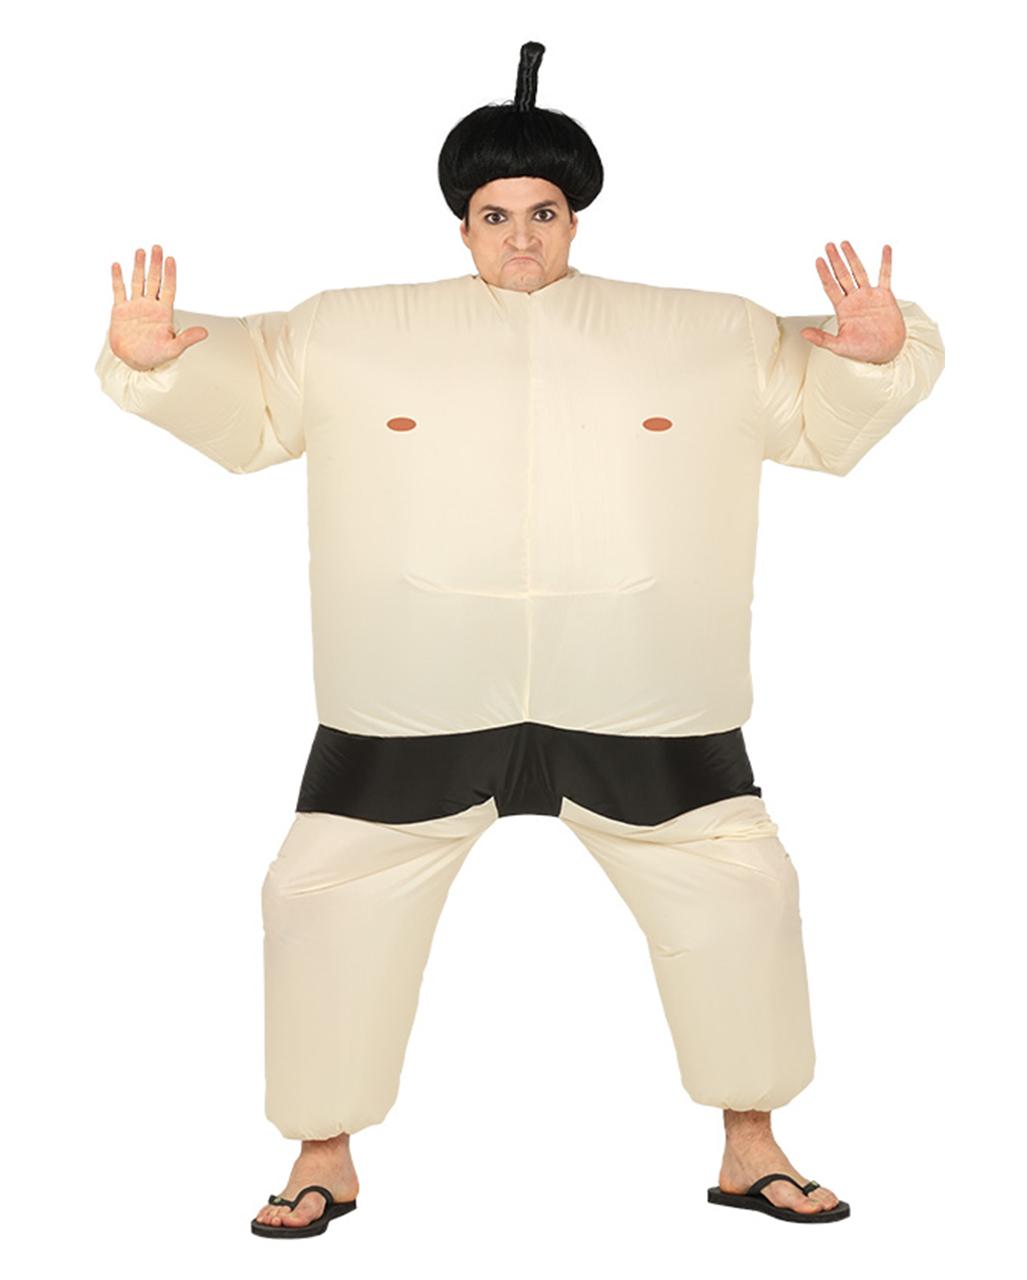 Inflatable Sumo Wrestling Costume Beige ...  sc 1 st  Horror-Shop.com & Inflatable Sumo Wrestling Costume Beige to buy   horror-shop.com